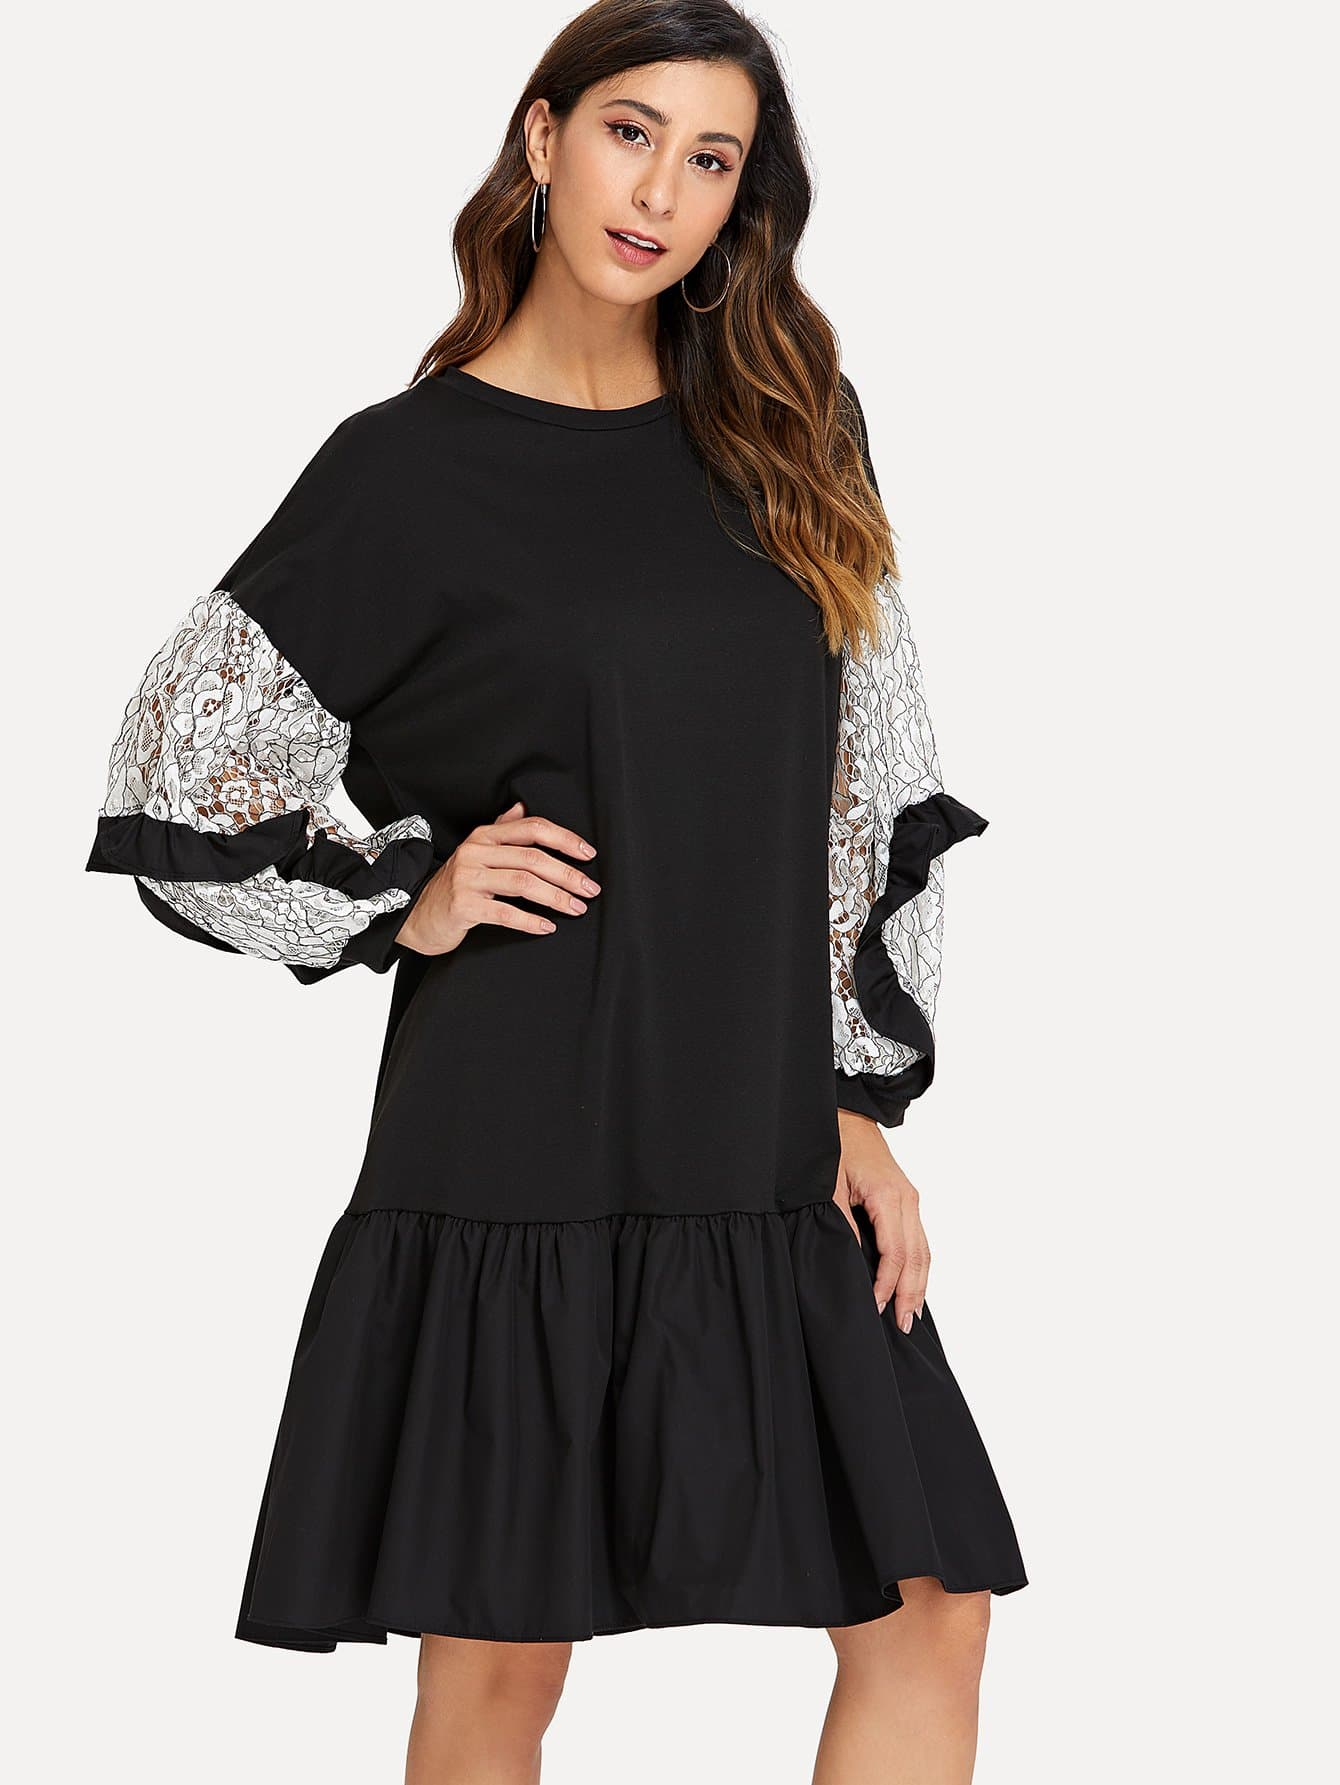 Contrast Lace Sleeve Ruffle Hem Dress lace contrast sleeve hanky hem dress